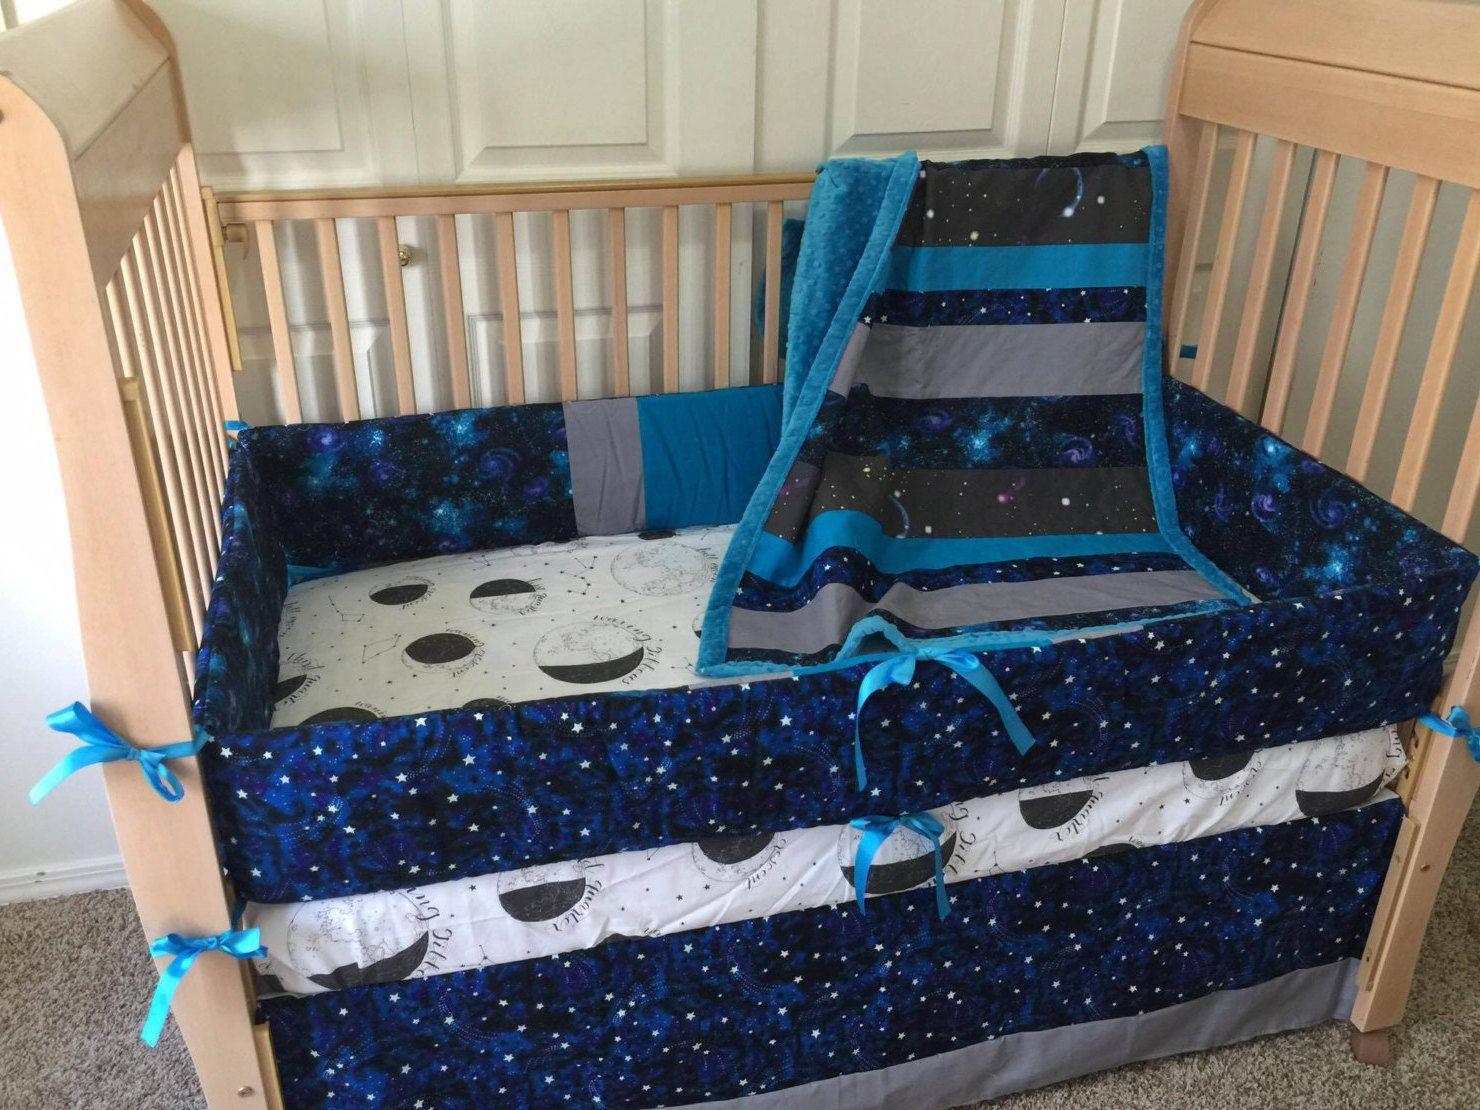 space bedding/galaxy bedding/constellation bedding/crib bedding